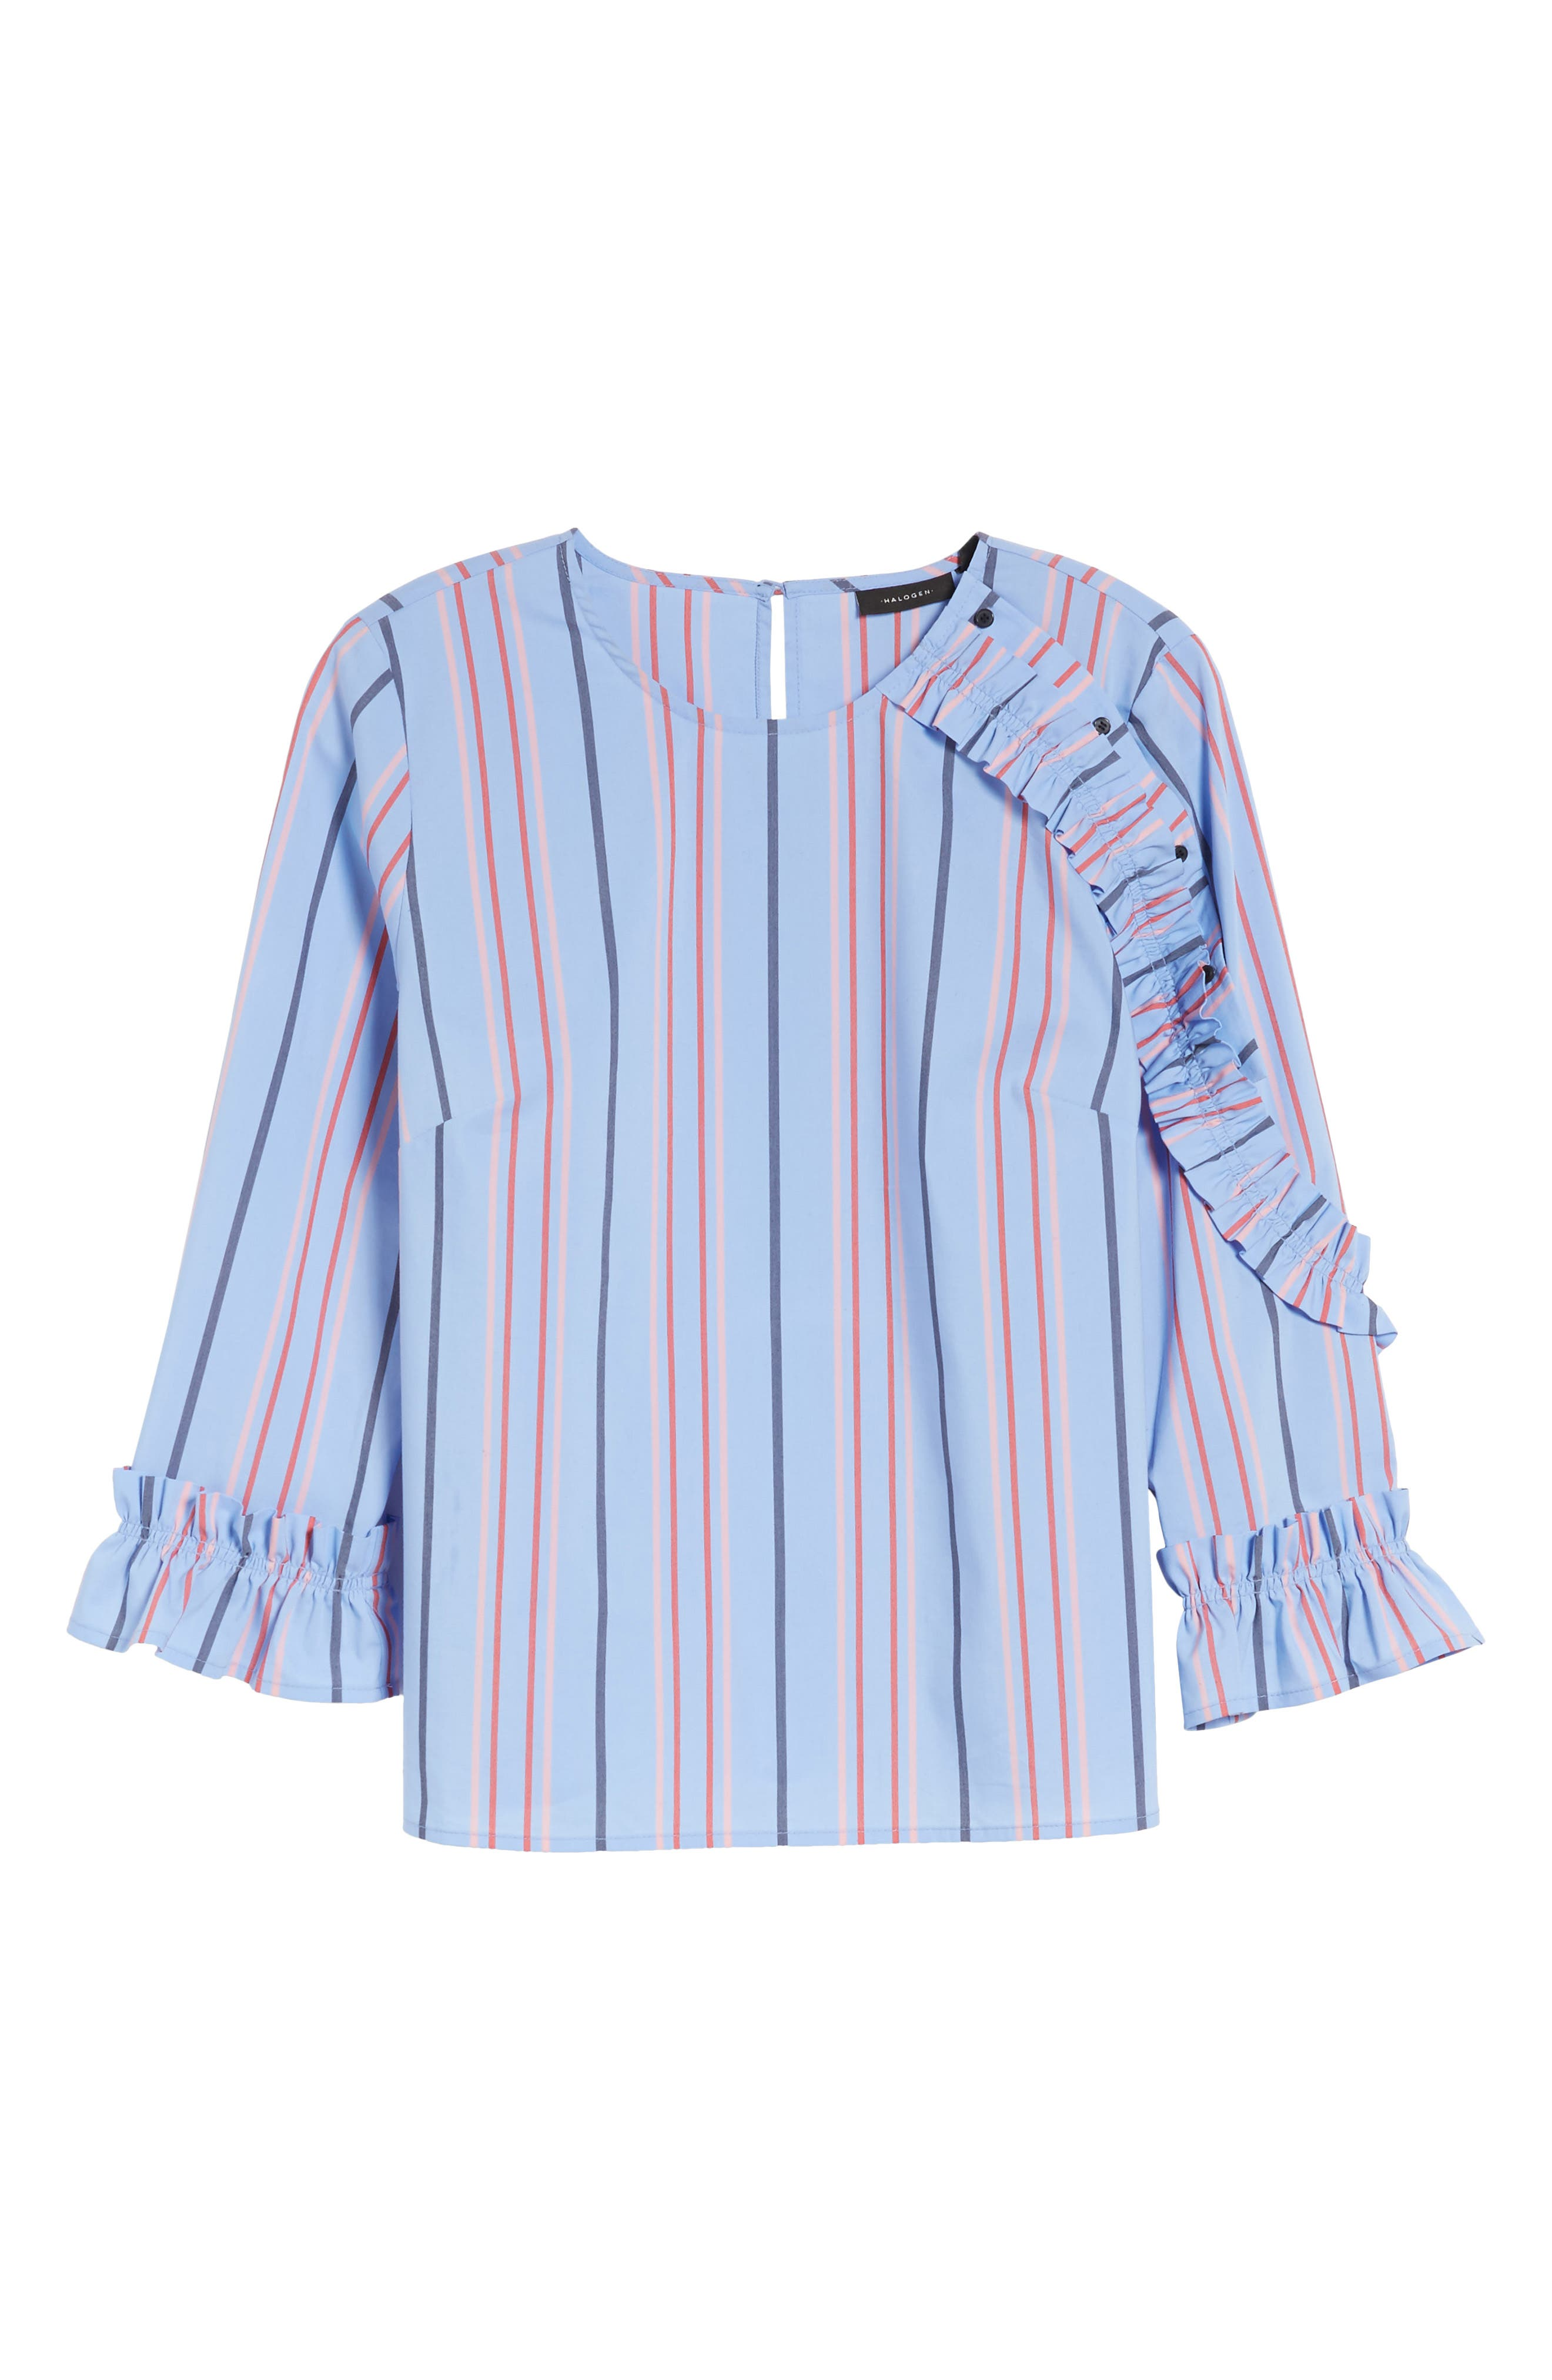 Ruffle Detail Poplin Shirt,                             Alternate thumbnail 6, color,                             Blue Multi Stripe